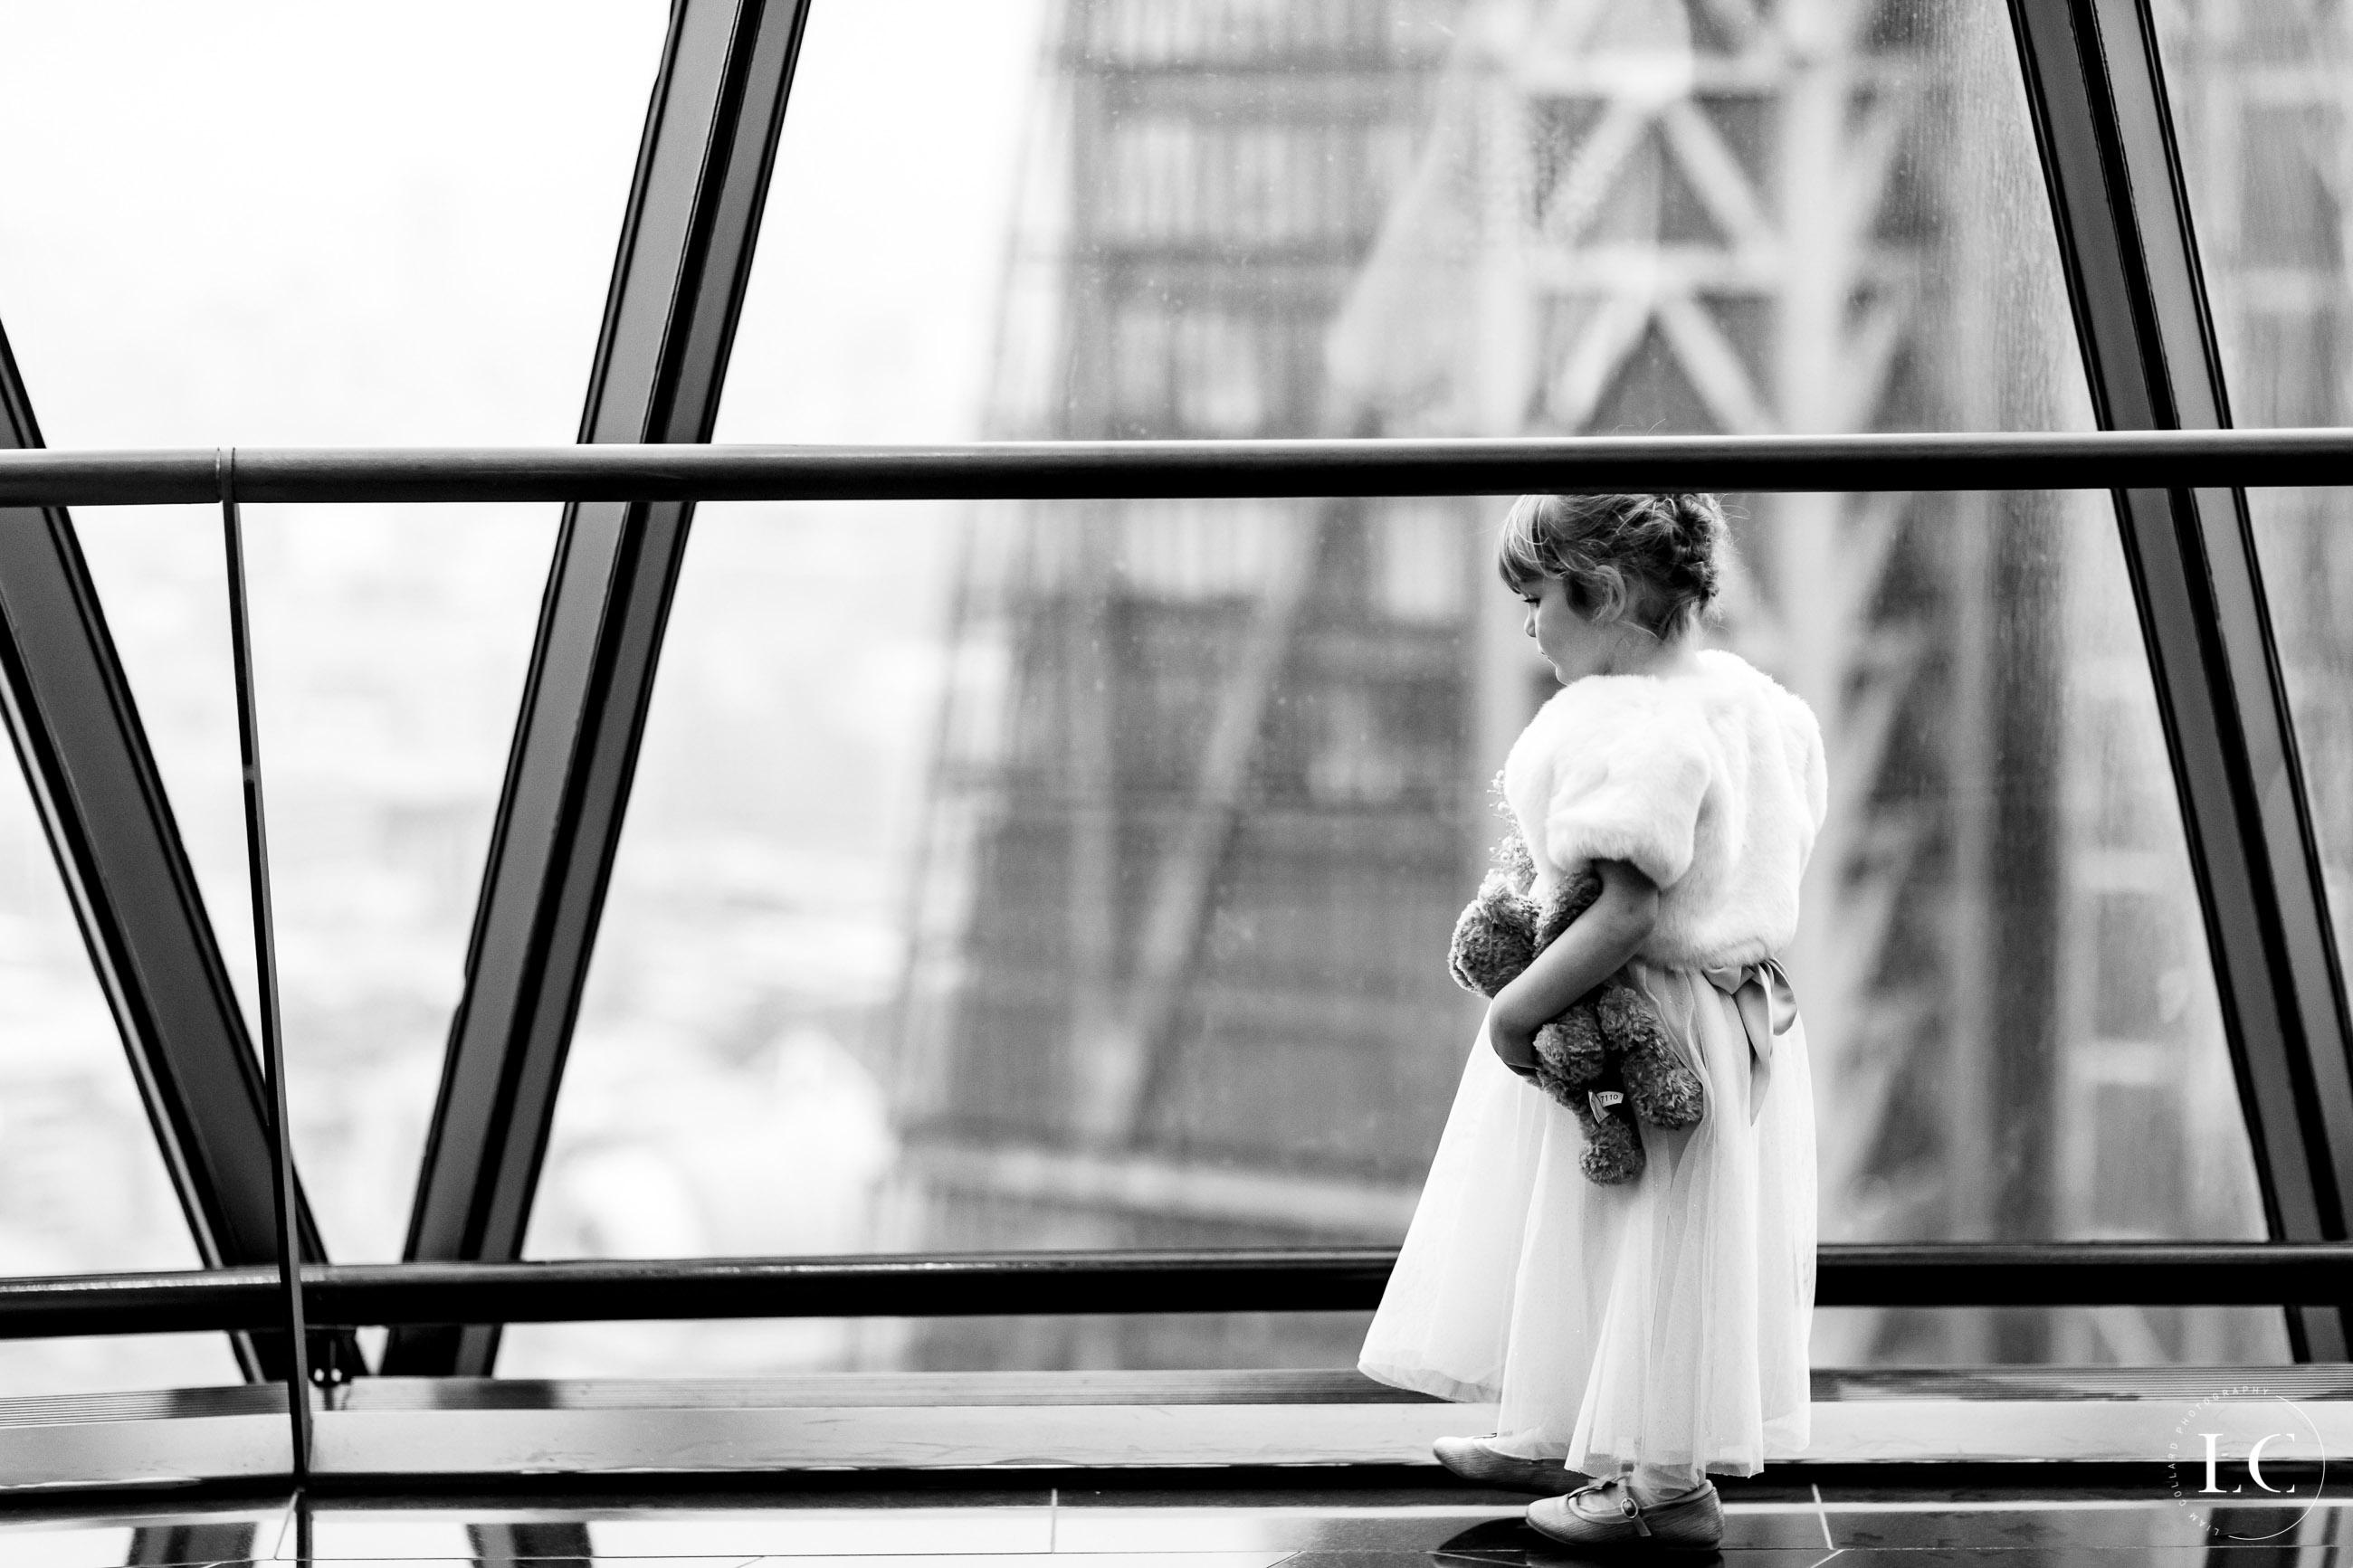 Child next to window